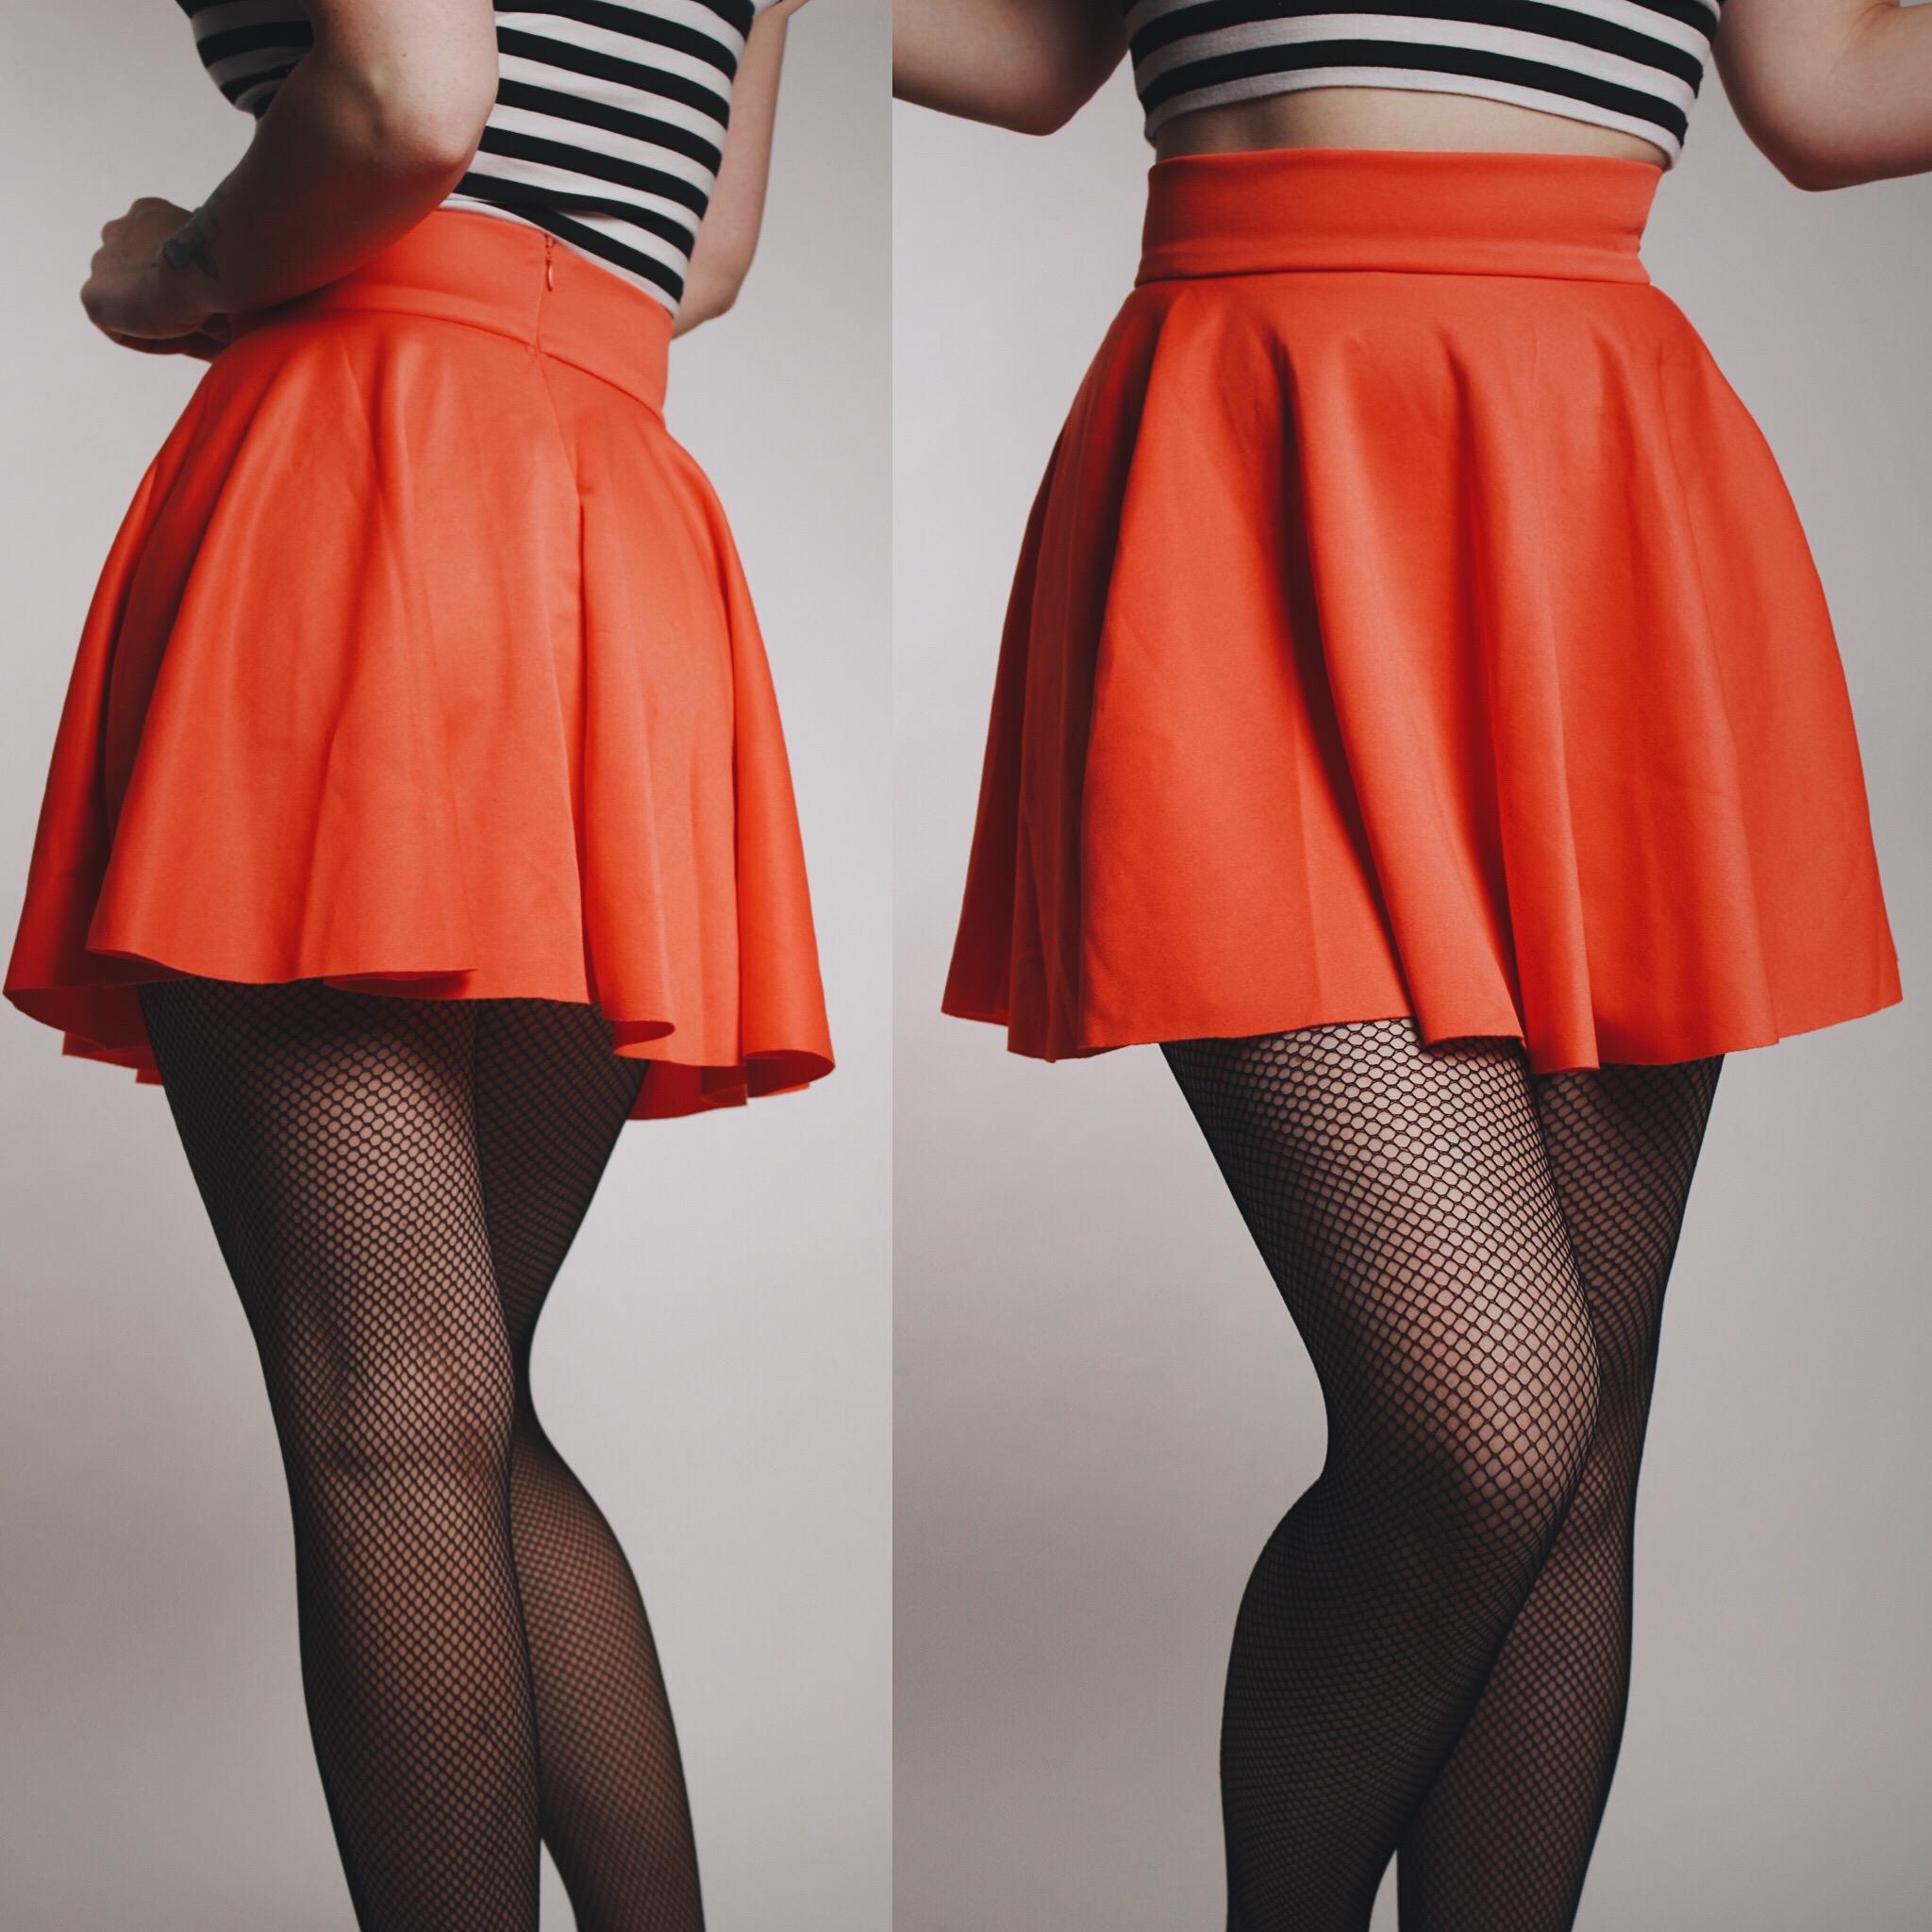 0714dc3573 CLAIMED  Joanne - Vintage 90s Neon Orange Spandex Skater Skirt ...